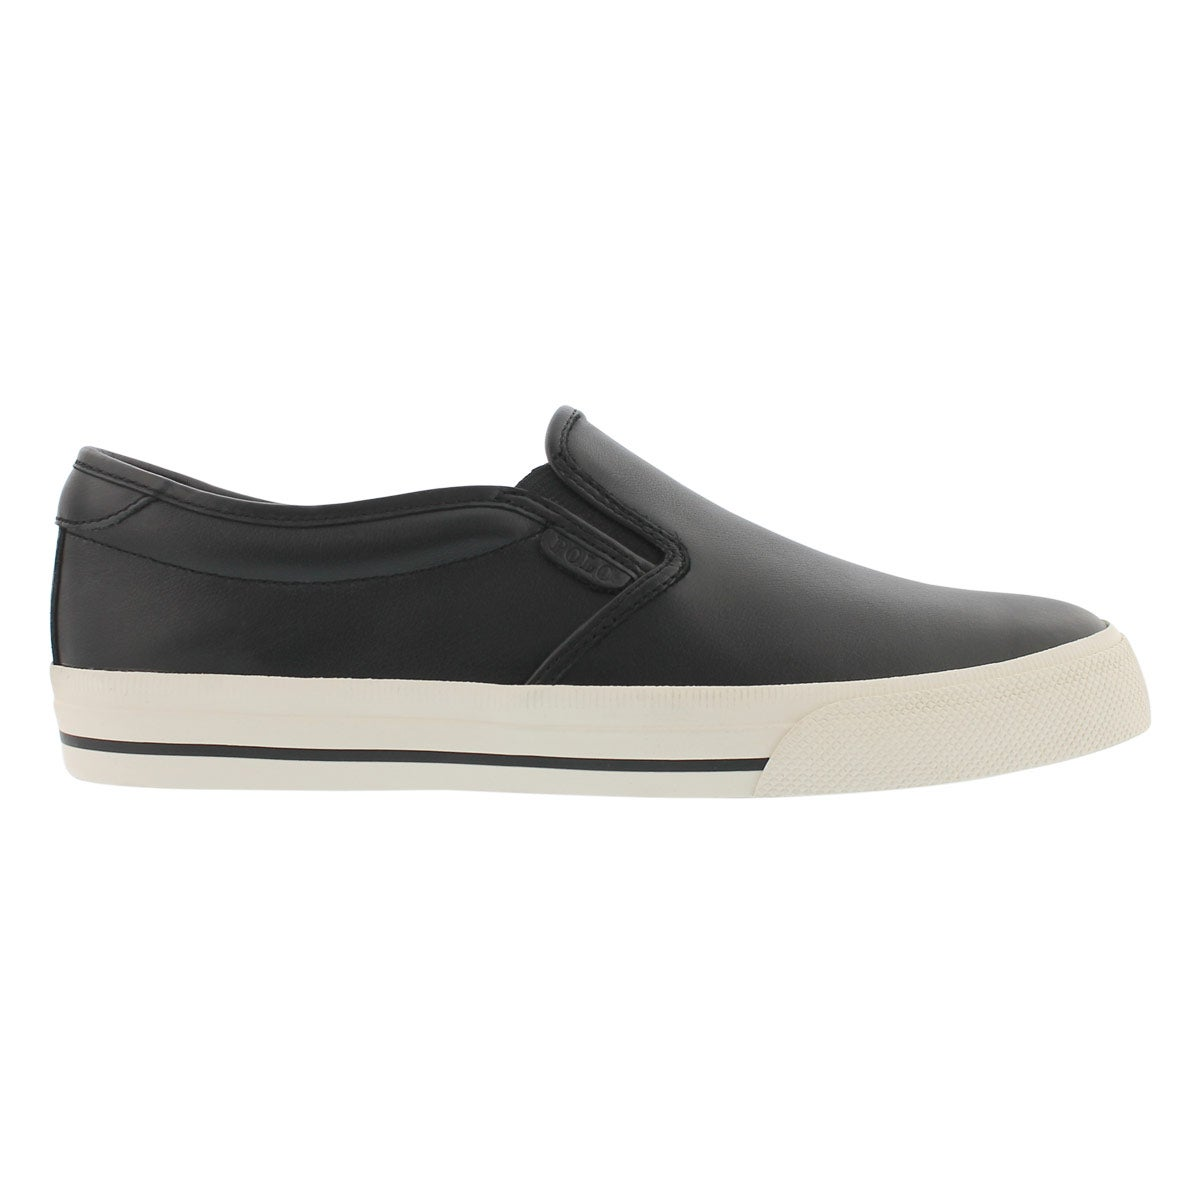 Polo Ralph Lauren Mens Fashion Sneakers